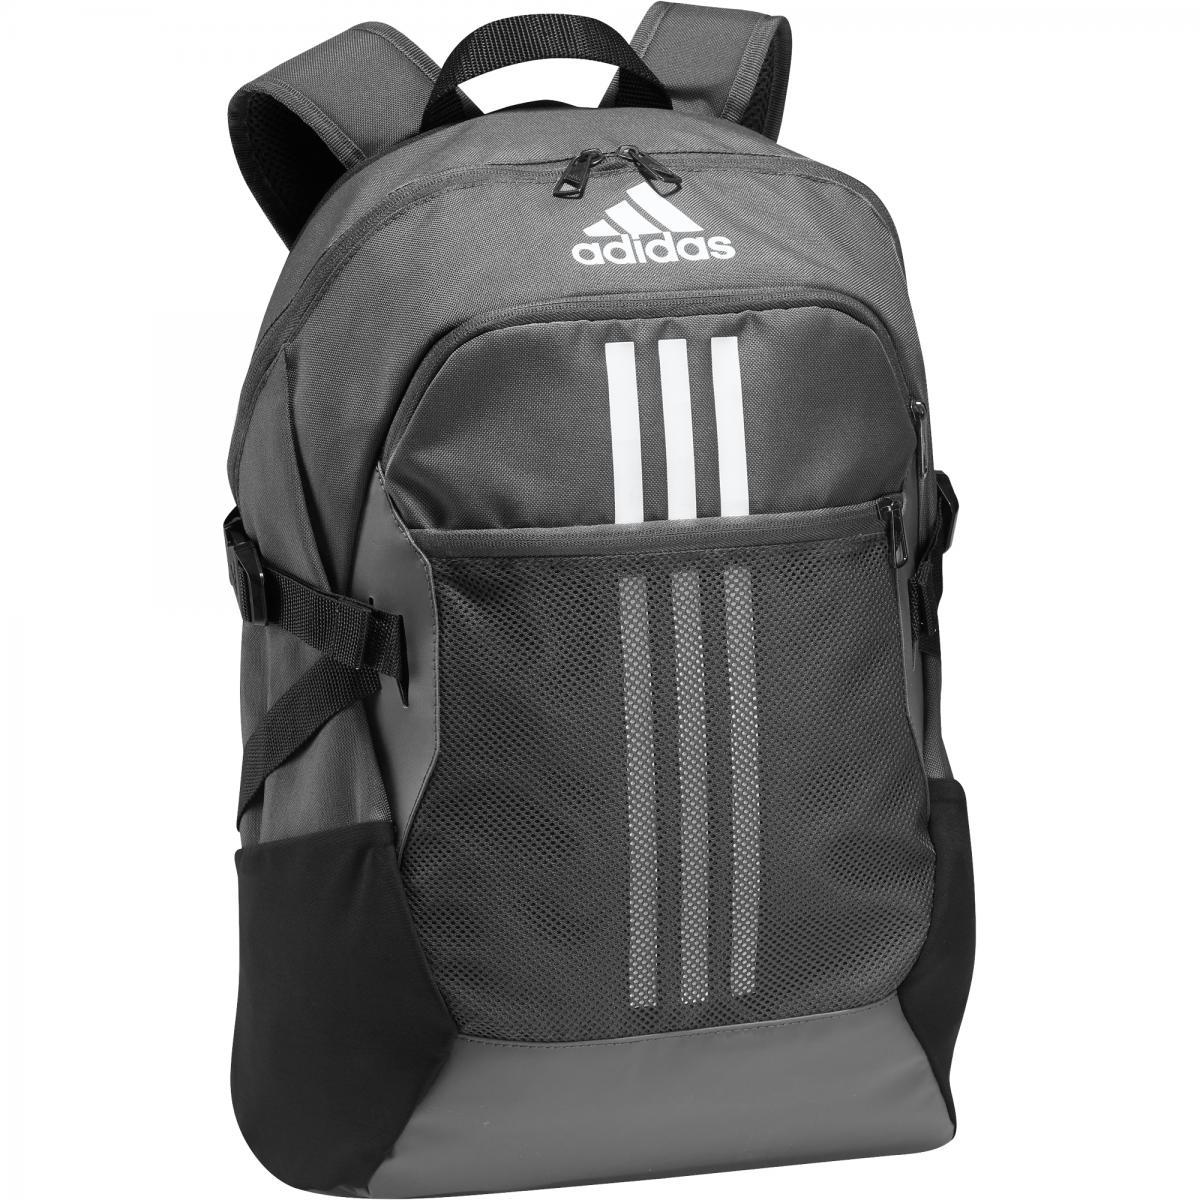 Adidas  Tiro Bp, ryggsekk, fritid